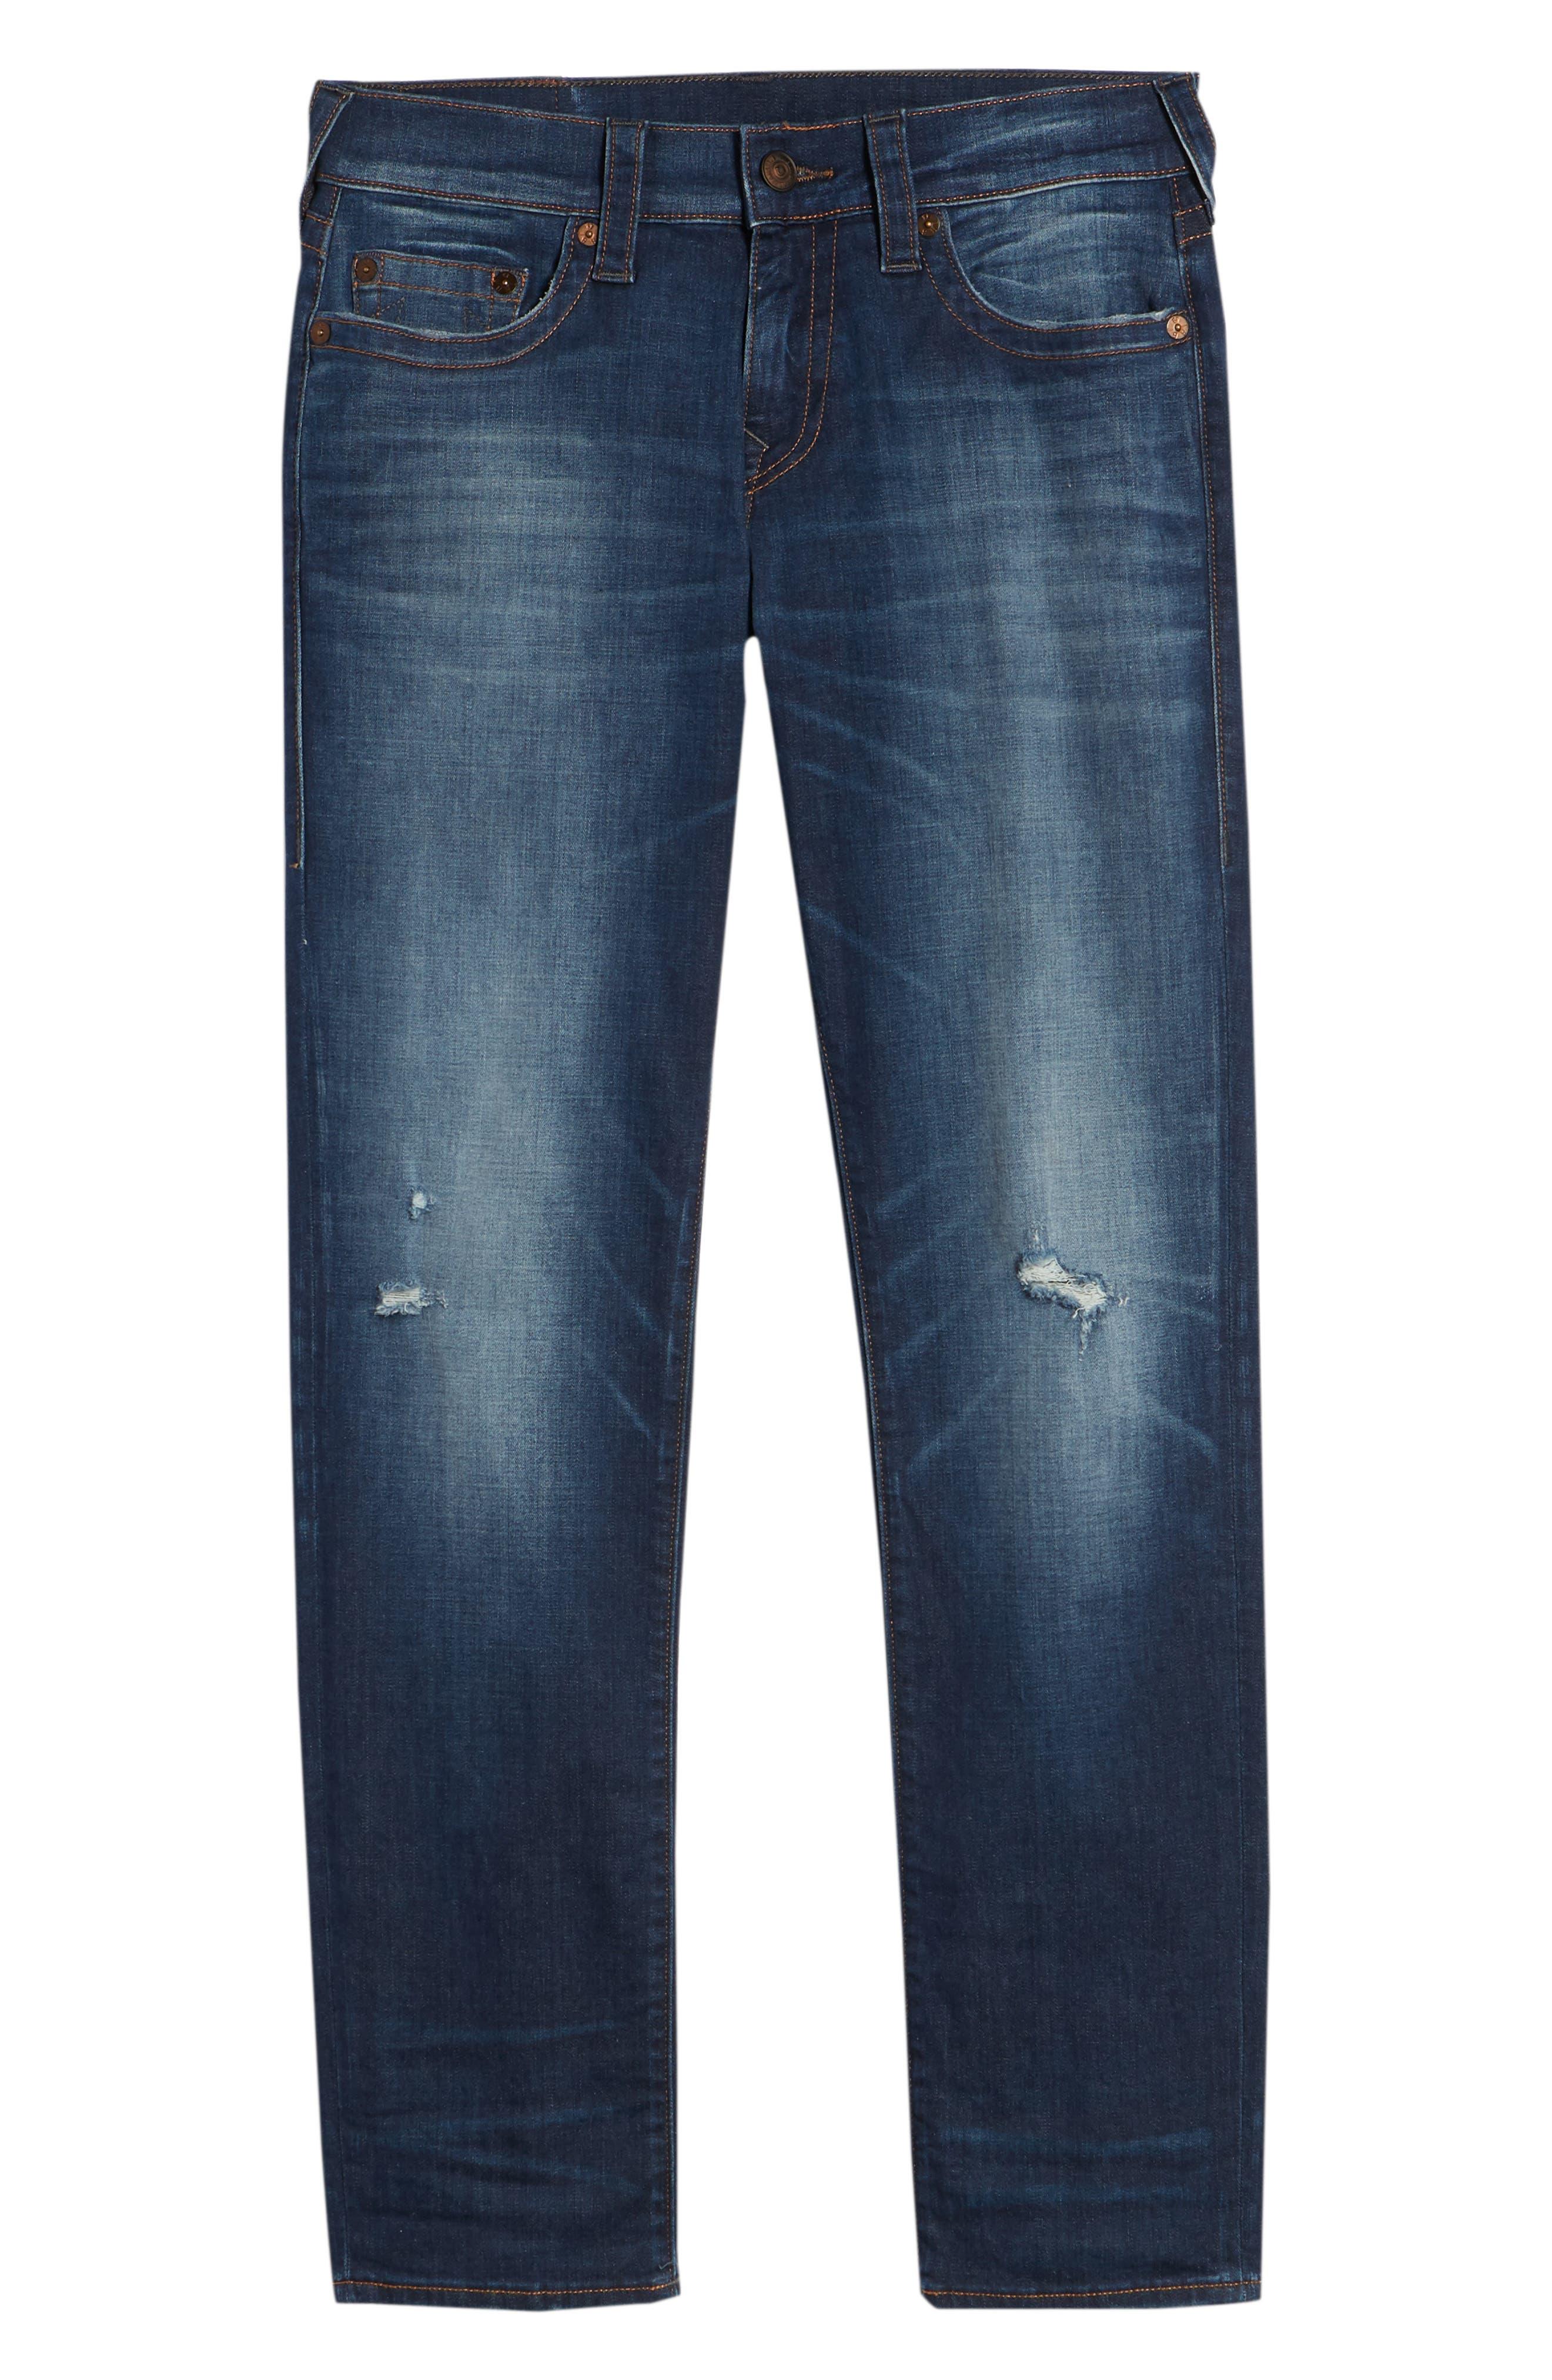 Geno Straight Leg Jeans,                             Alternate thumbnail 6, color,                             Suspect